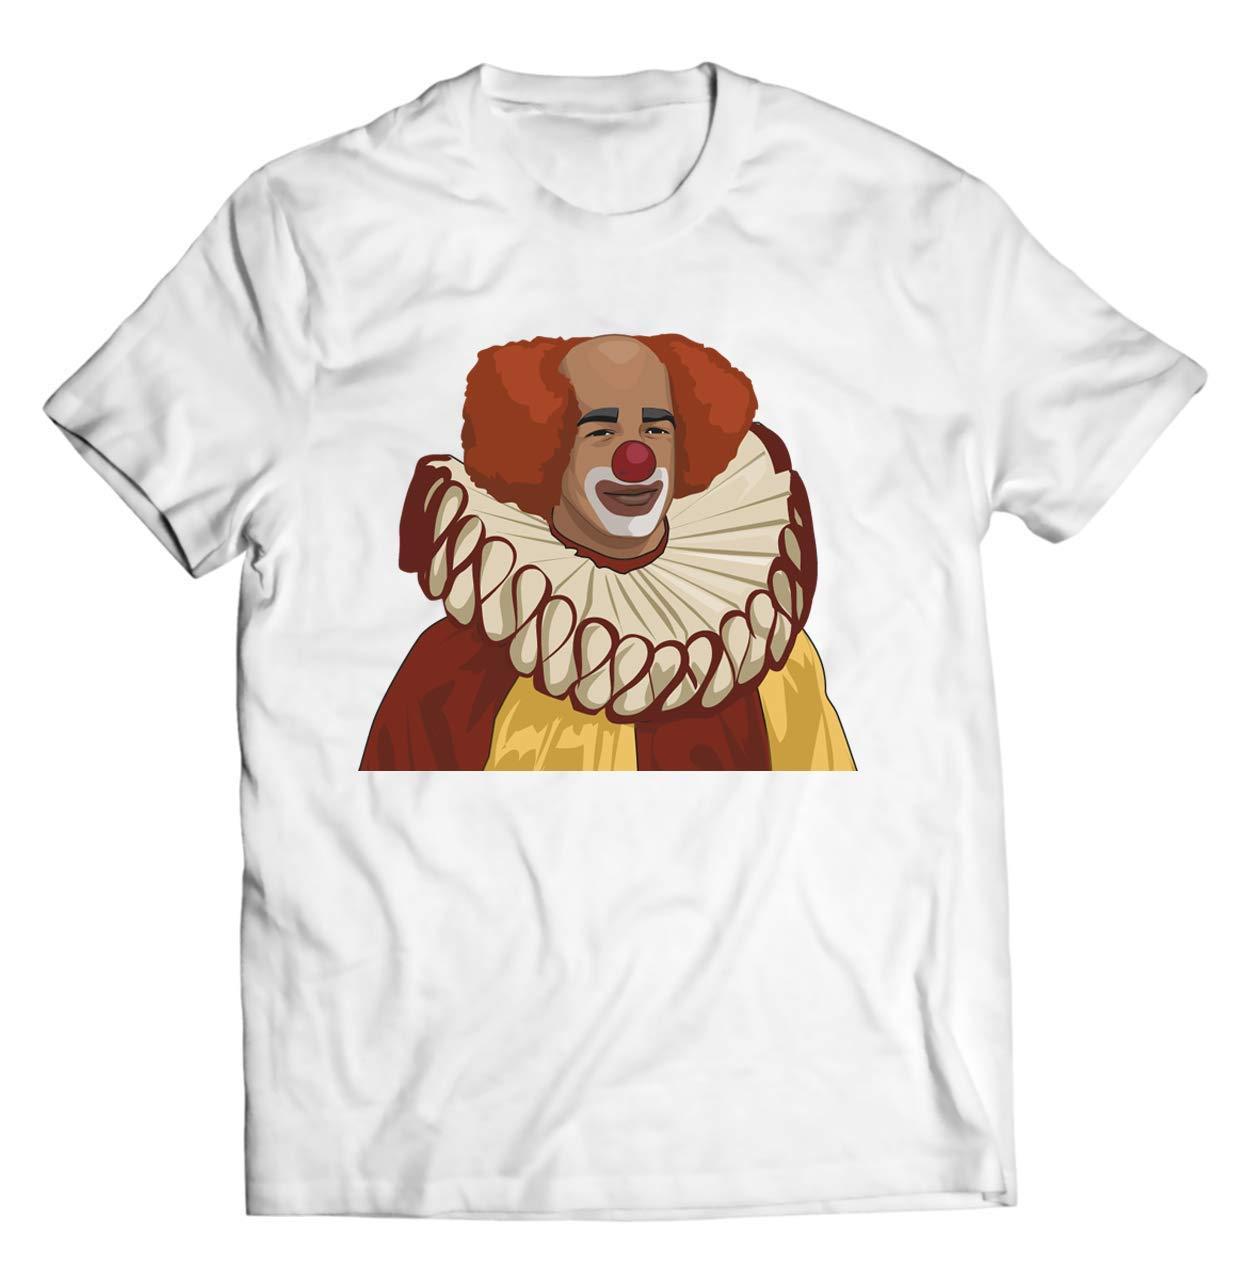 The Clown t-shirt